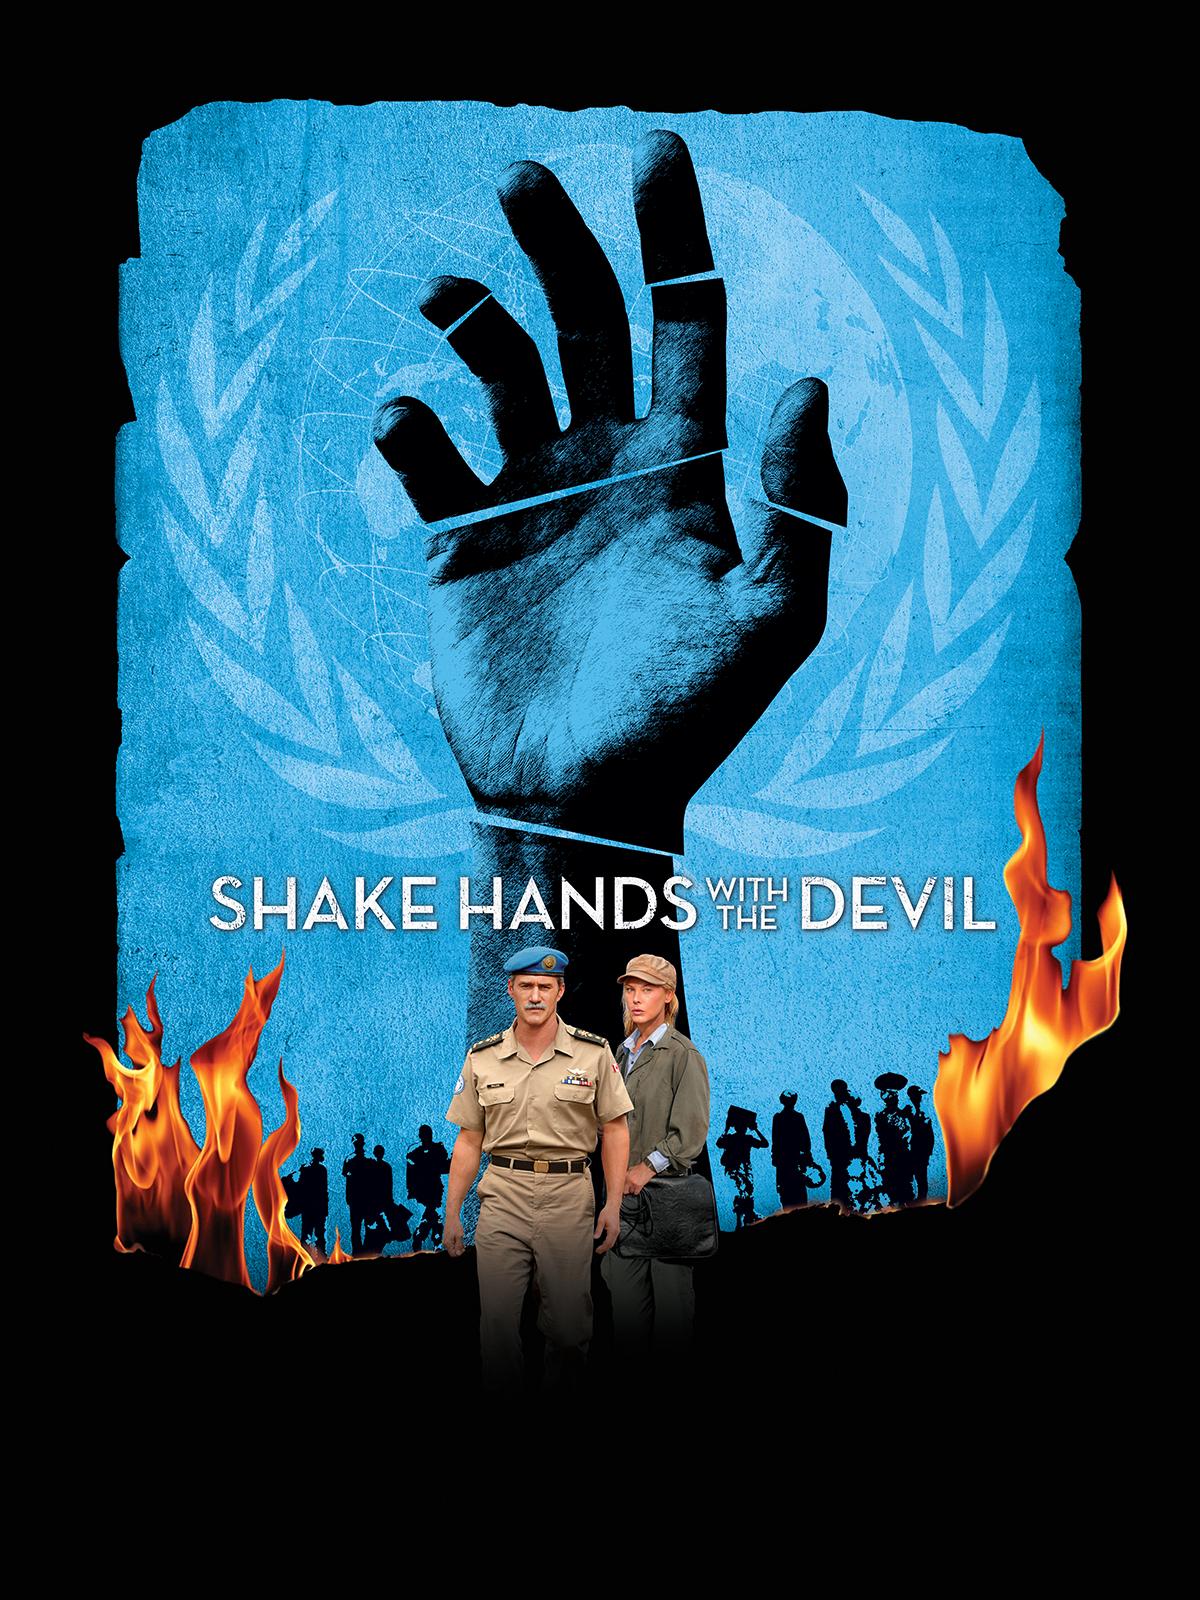 Here-ShakeHandsWithTheDevil-Full-Image-en-US.jpg